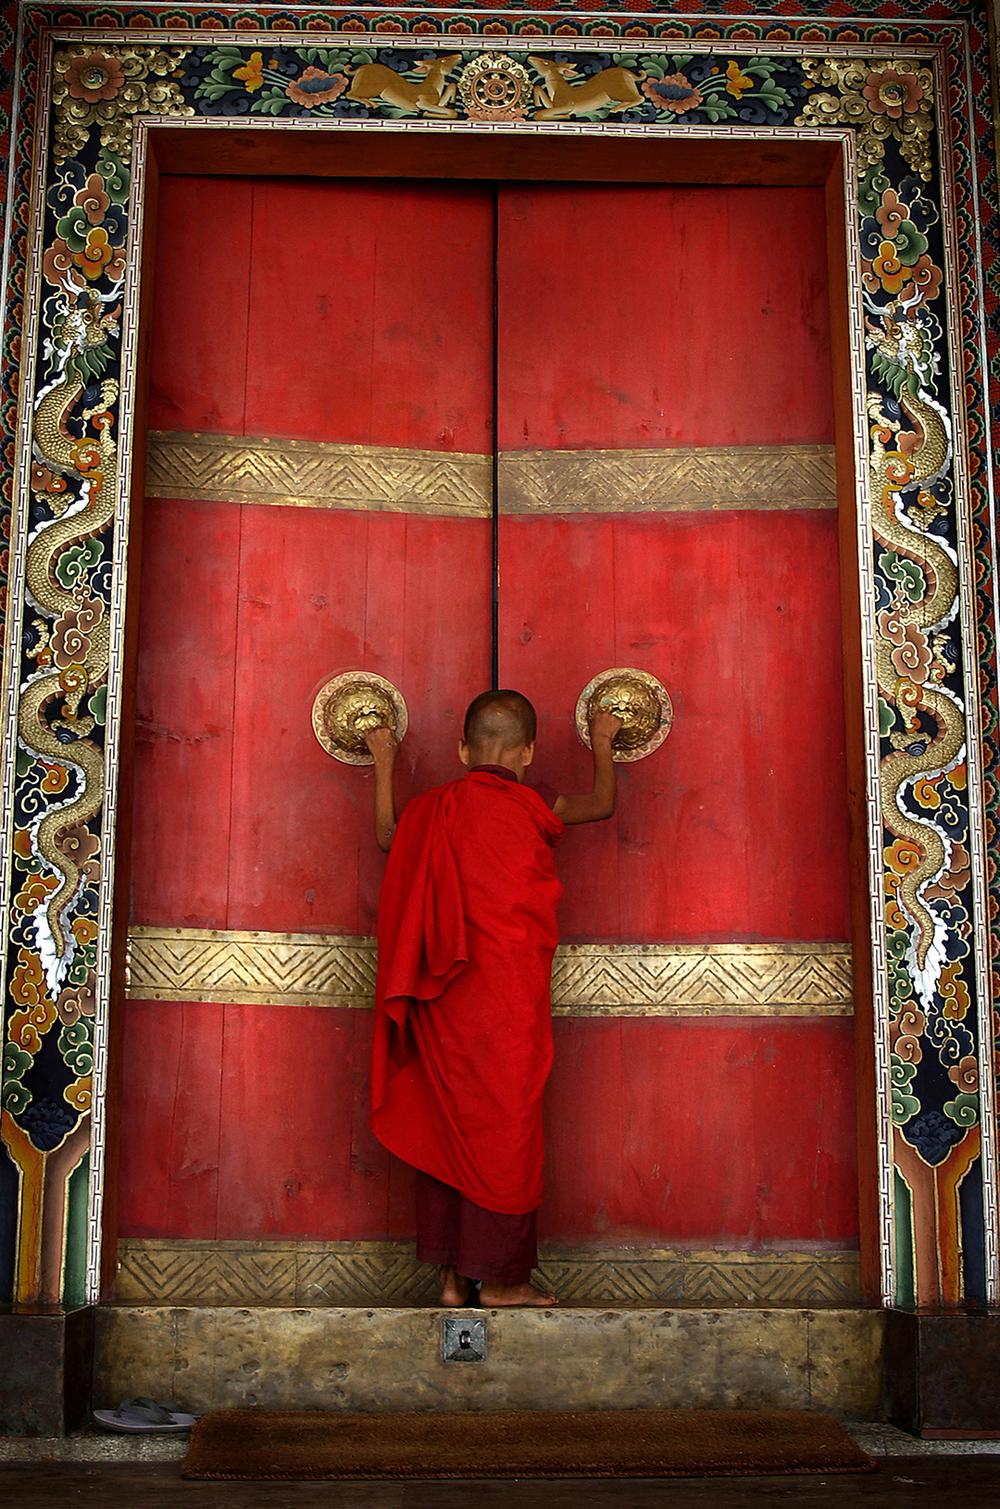 BHUTAN:THE LAST SHANGRI LA